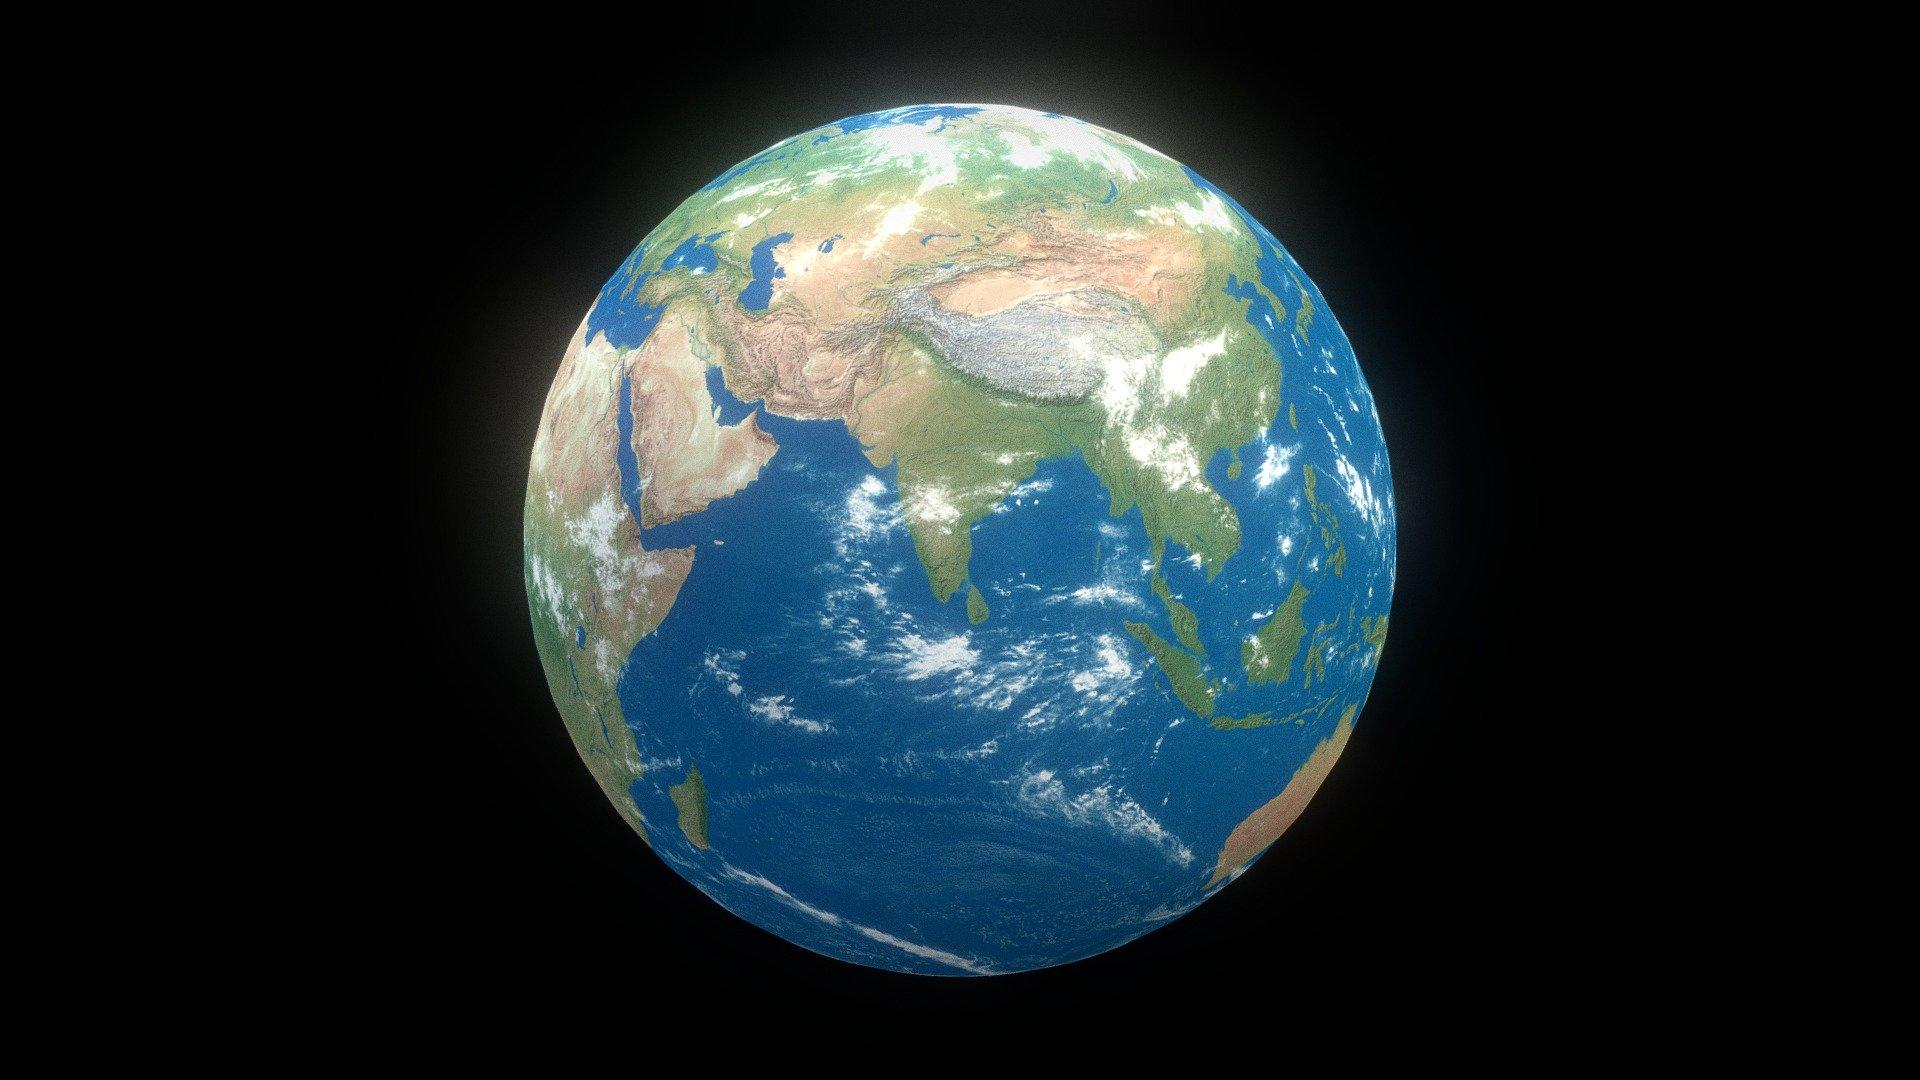 Earth - Download Free 3D model by Akshat (@shooter24994) [41fc80d] - Sketchfab